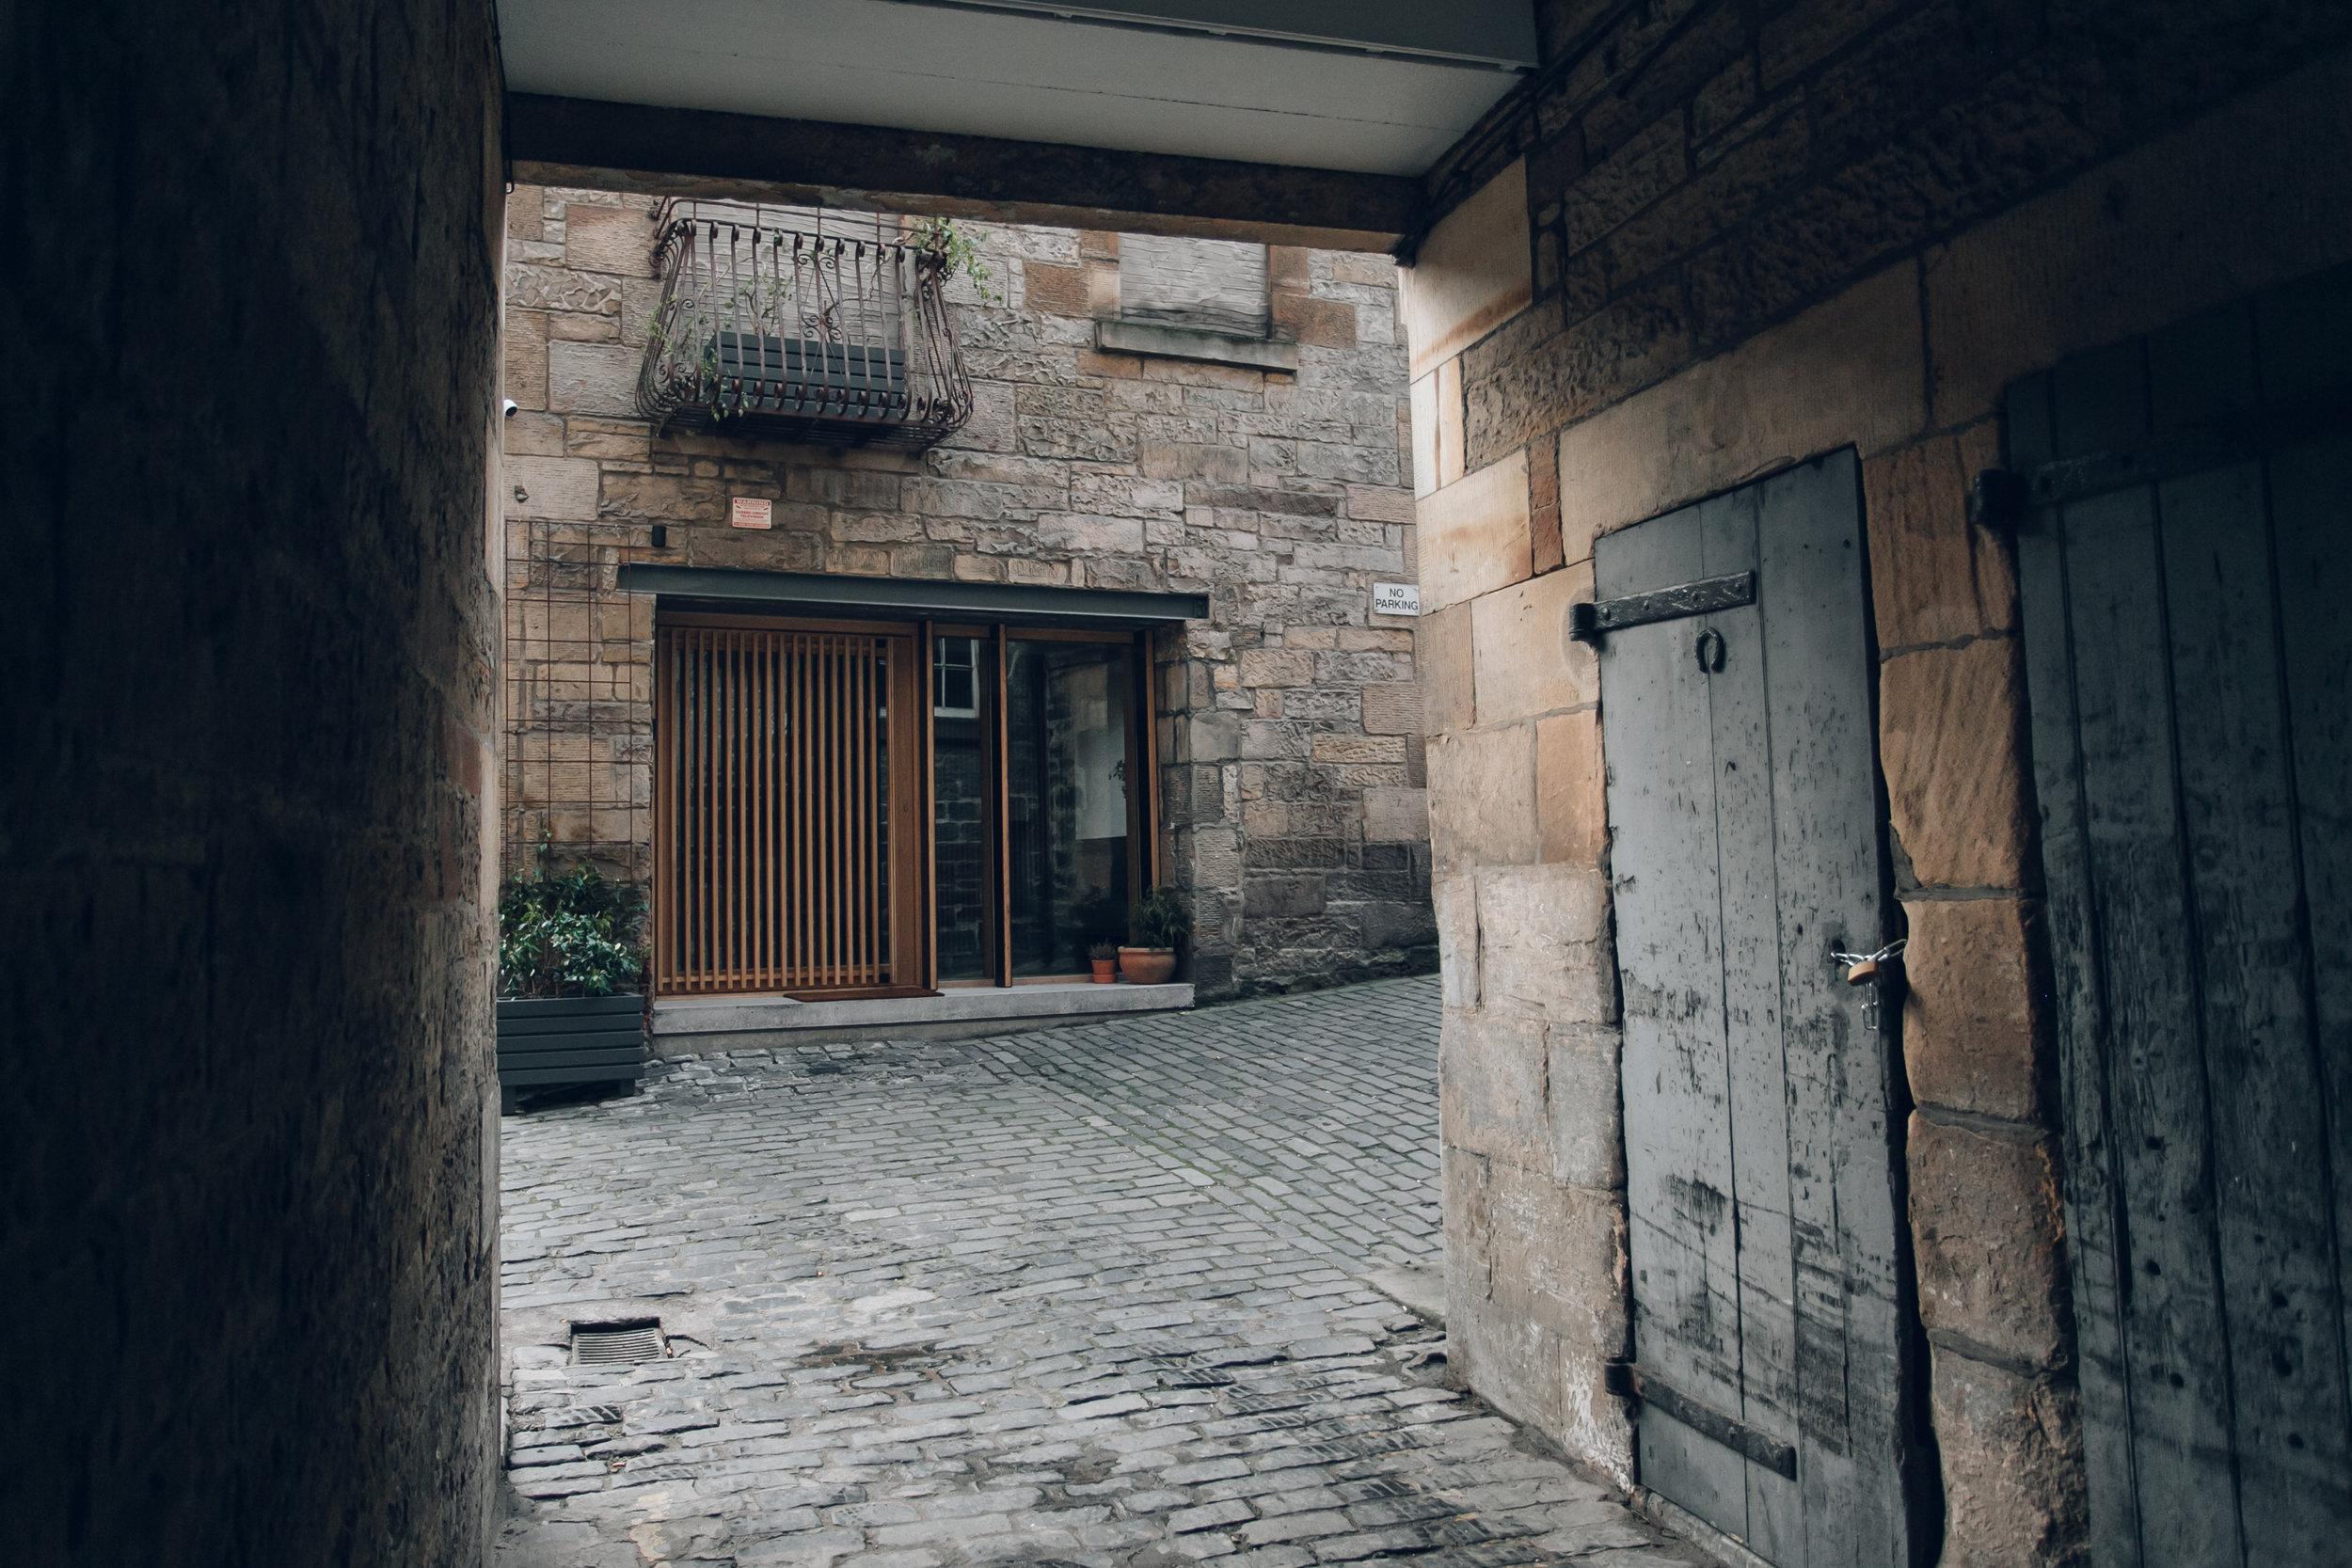 Porteous' Studio in Edinburgh by Haarkon